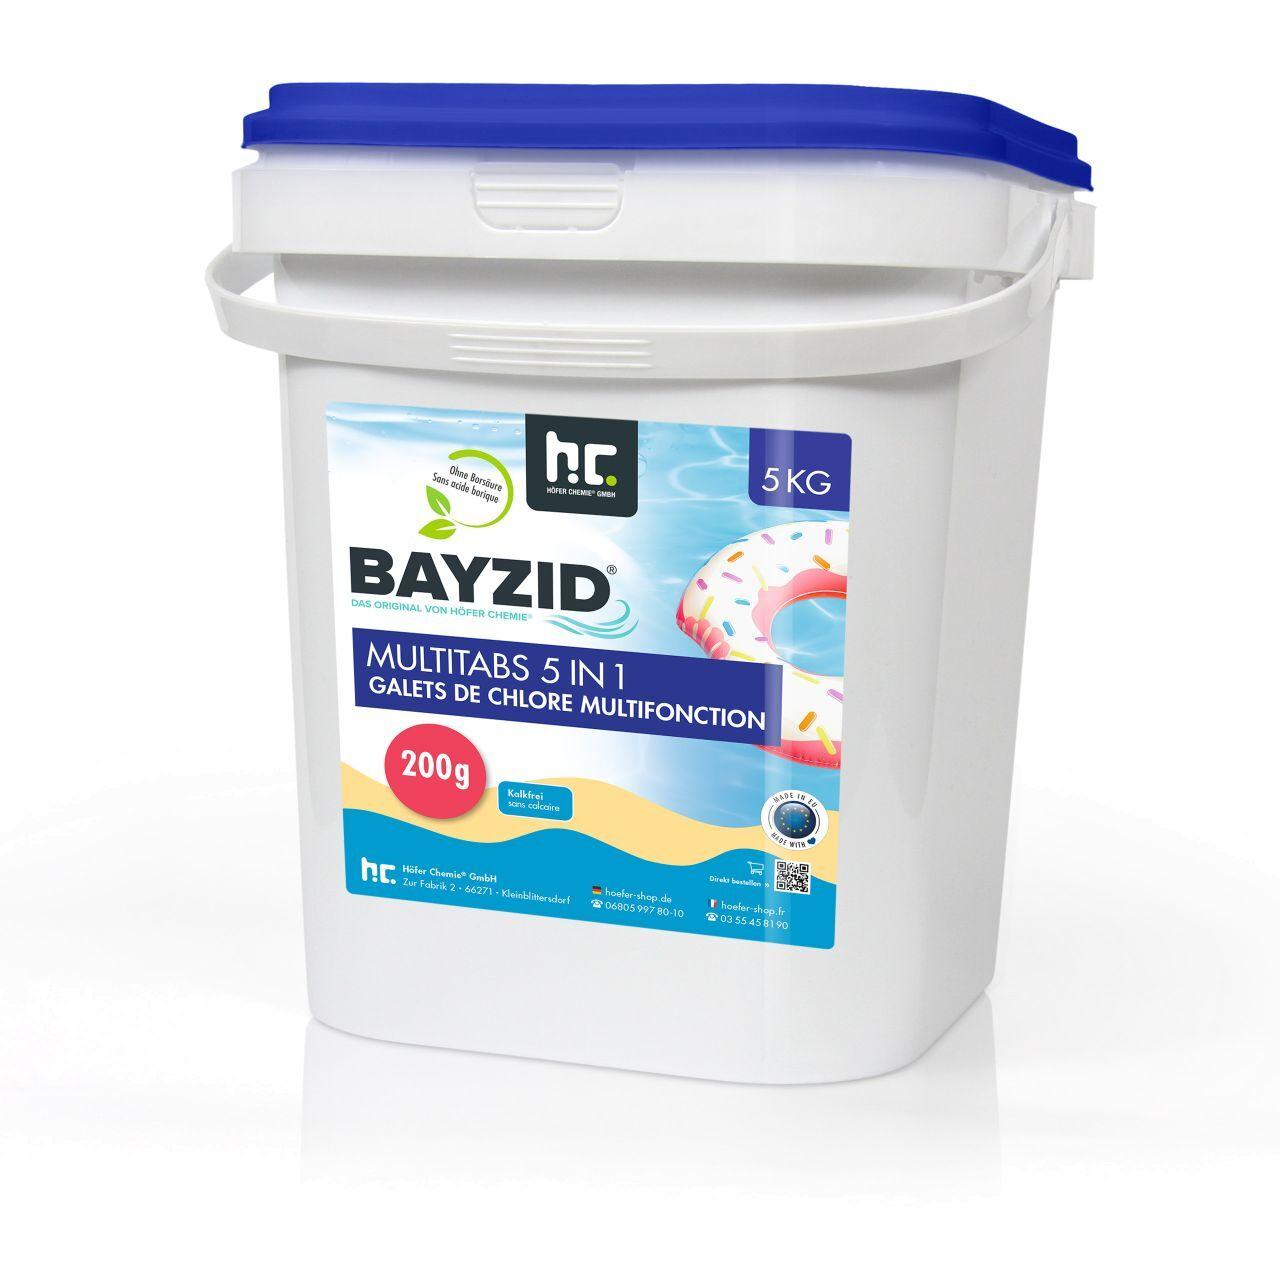 BAYZID 10 kg Bayzid® Galets de chlore multifonction (200g) (2 x 5 kg)